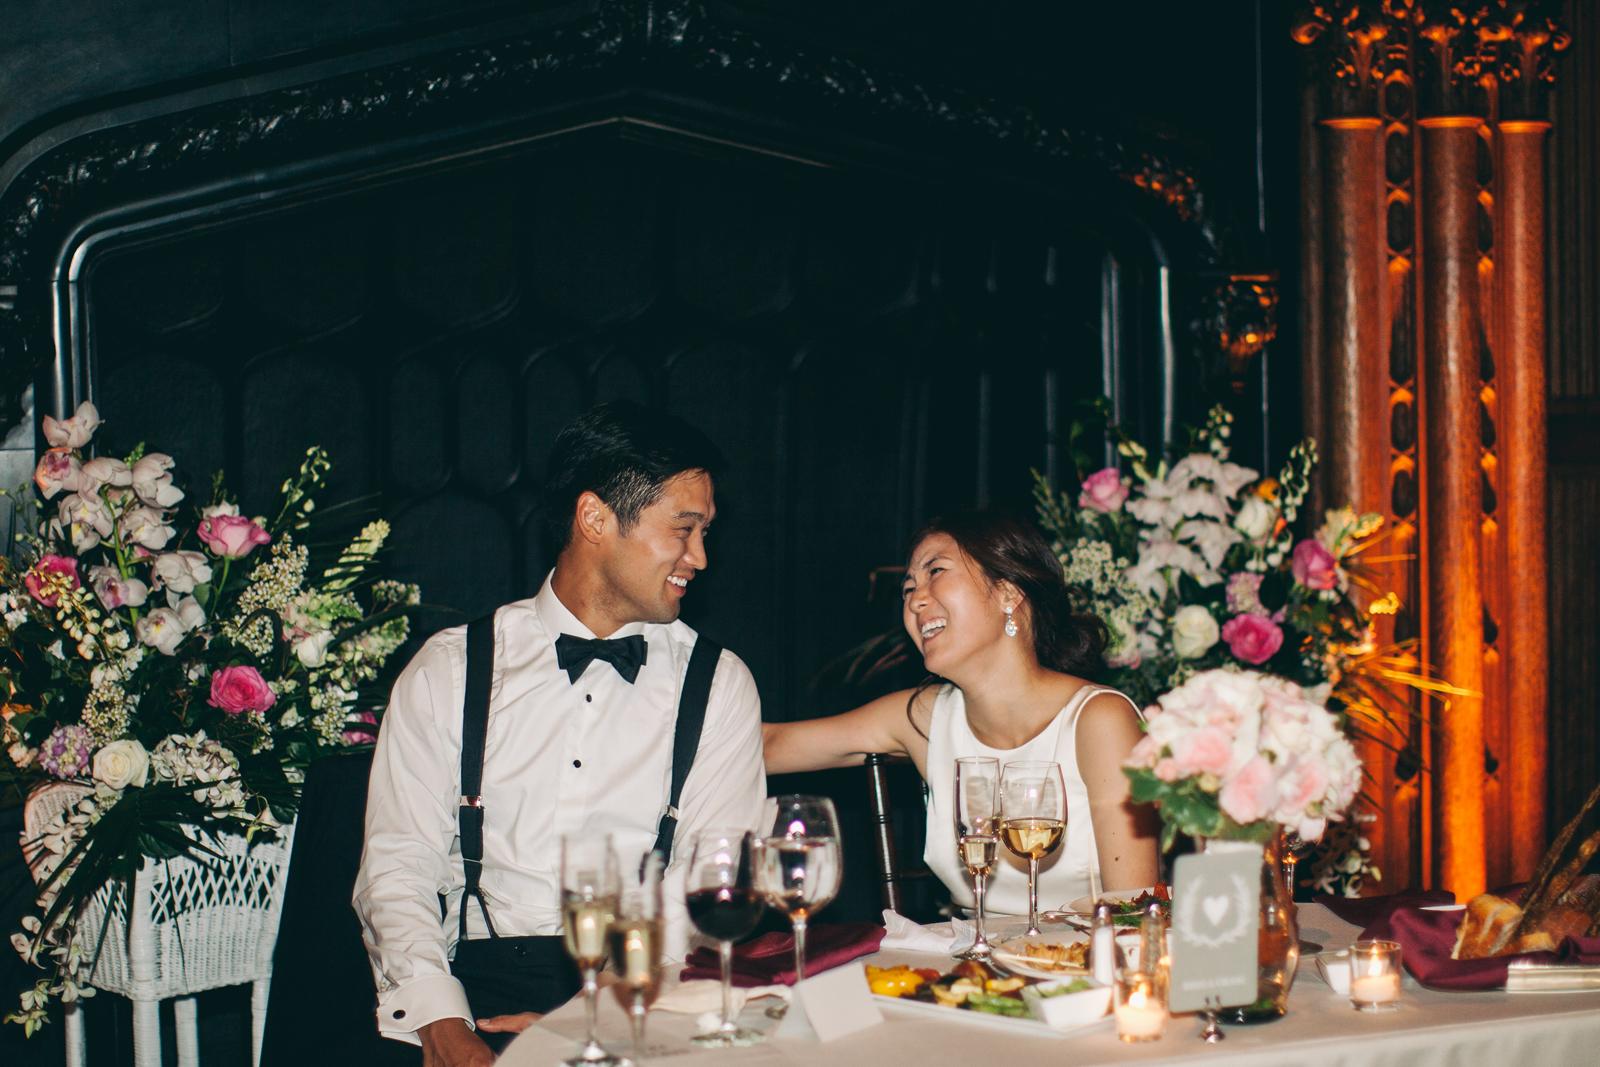 kohl_manison_wedding_photography_sarah_eric_ebony_siovhan_bokeh_photography_095.jpg